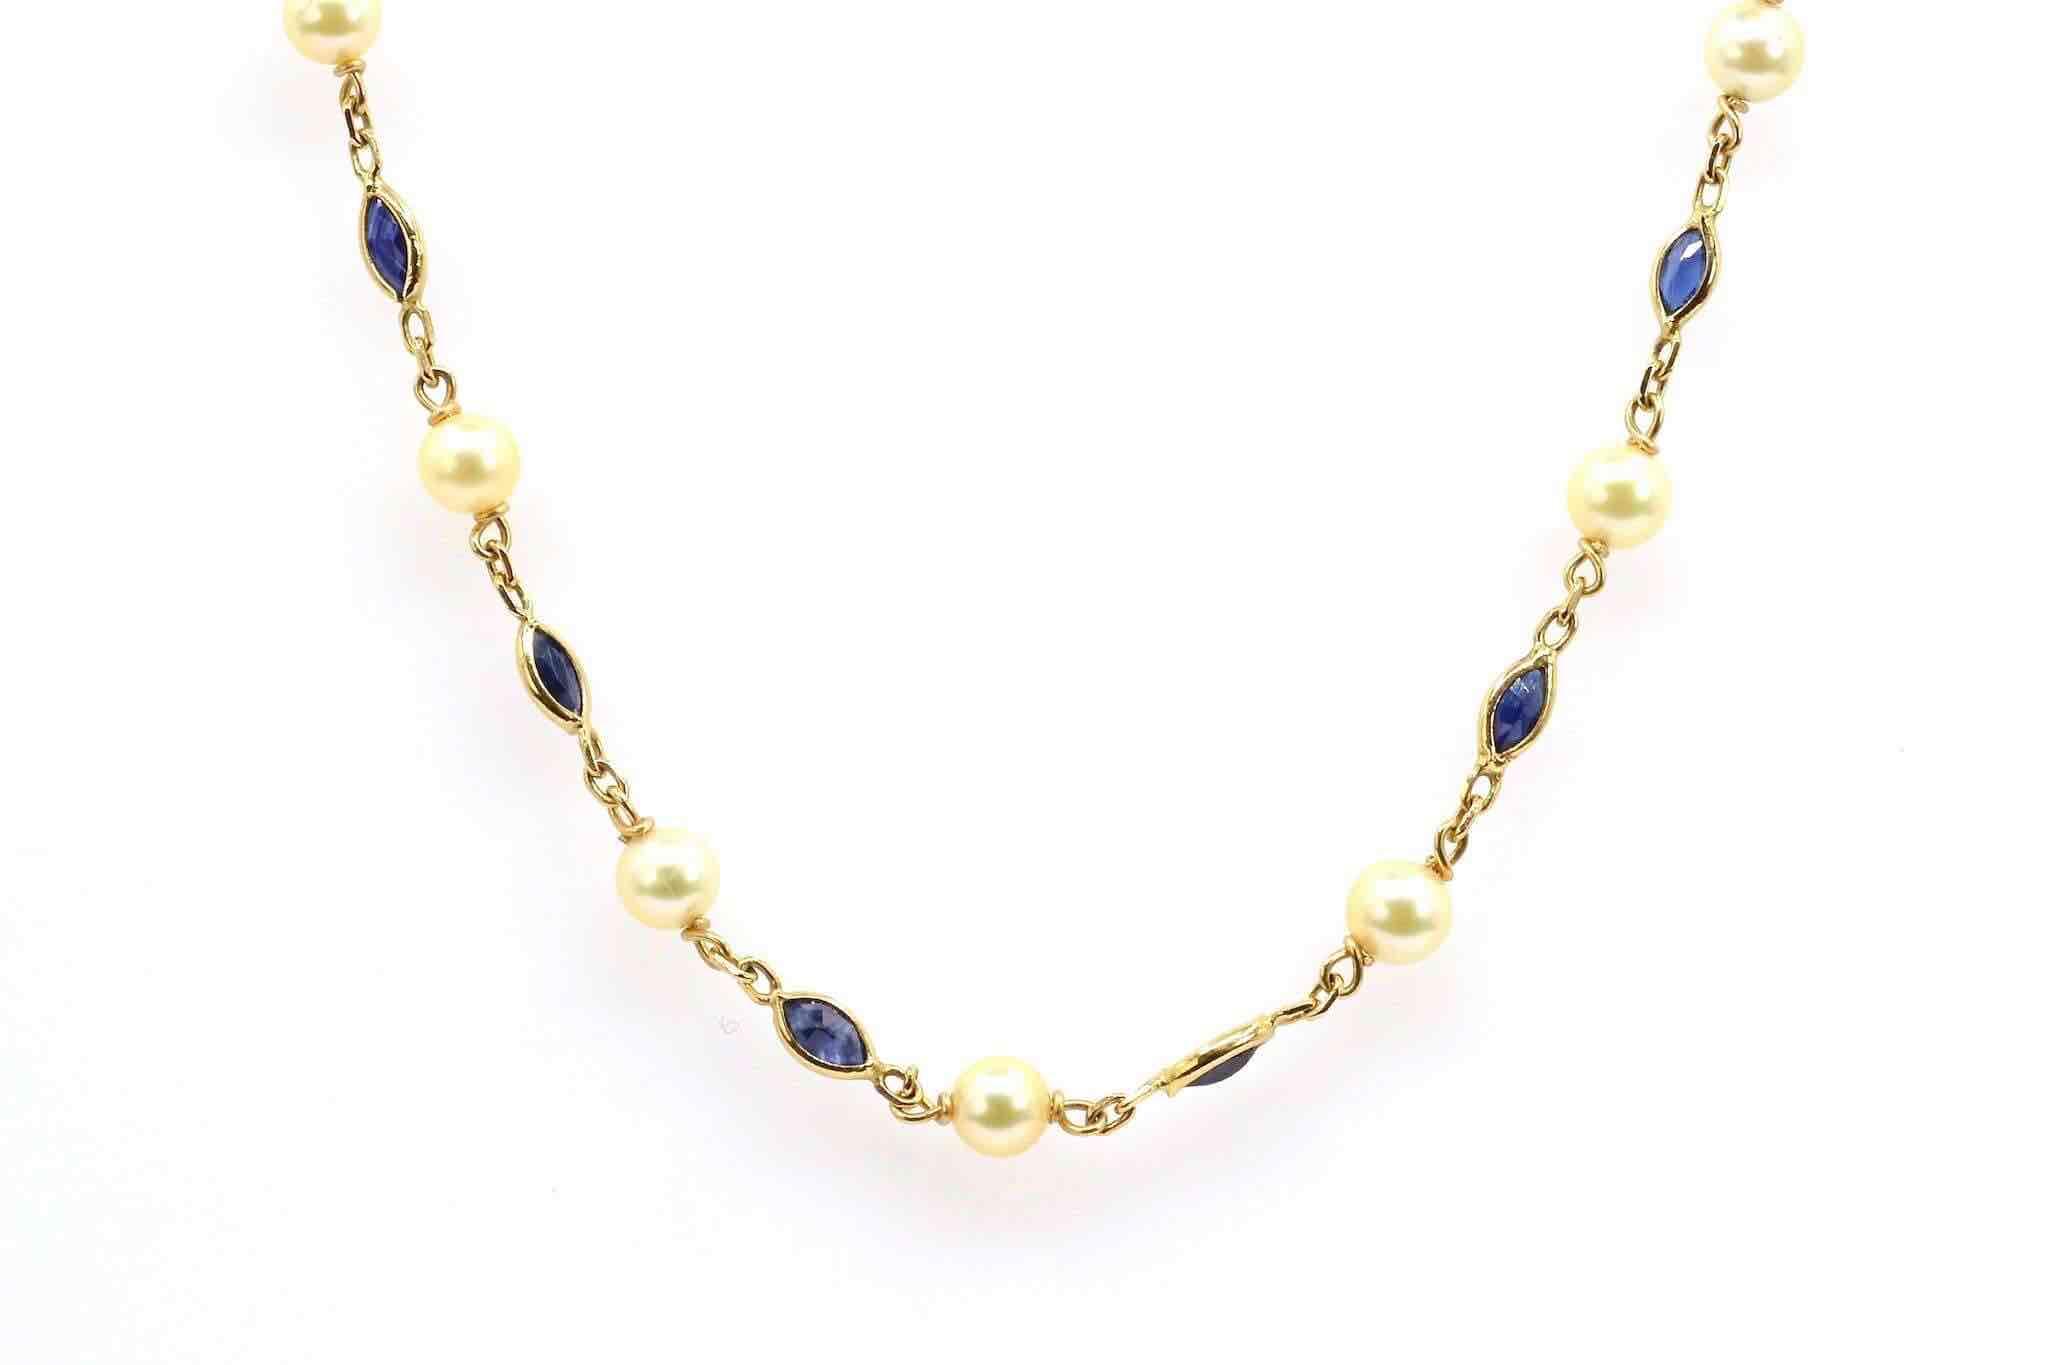 achat collier en or